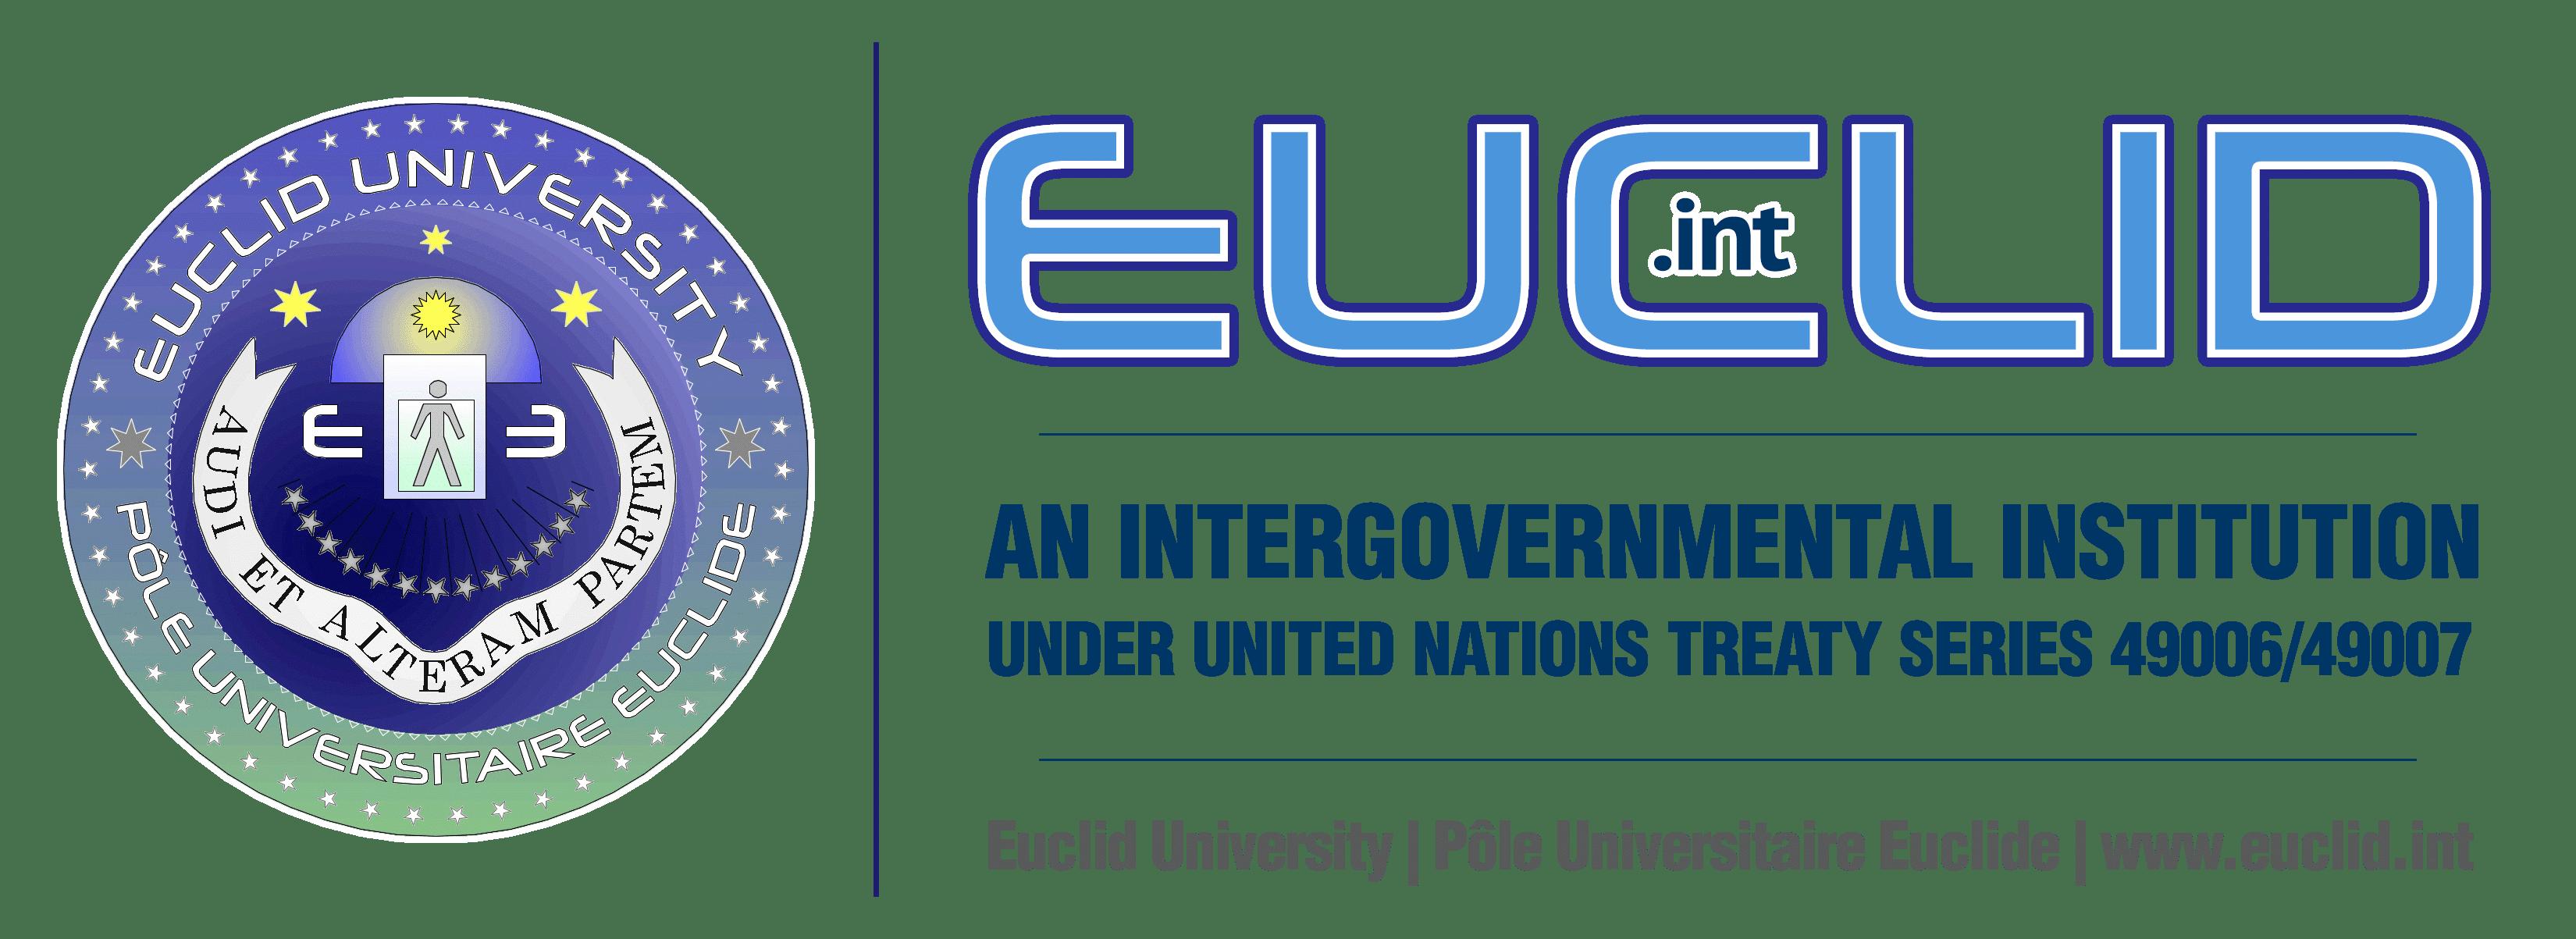 EUCLID logo for Stripe